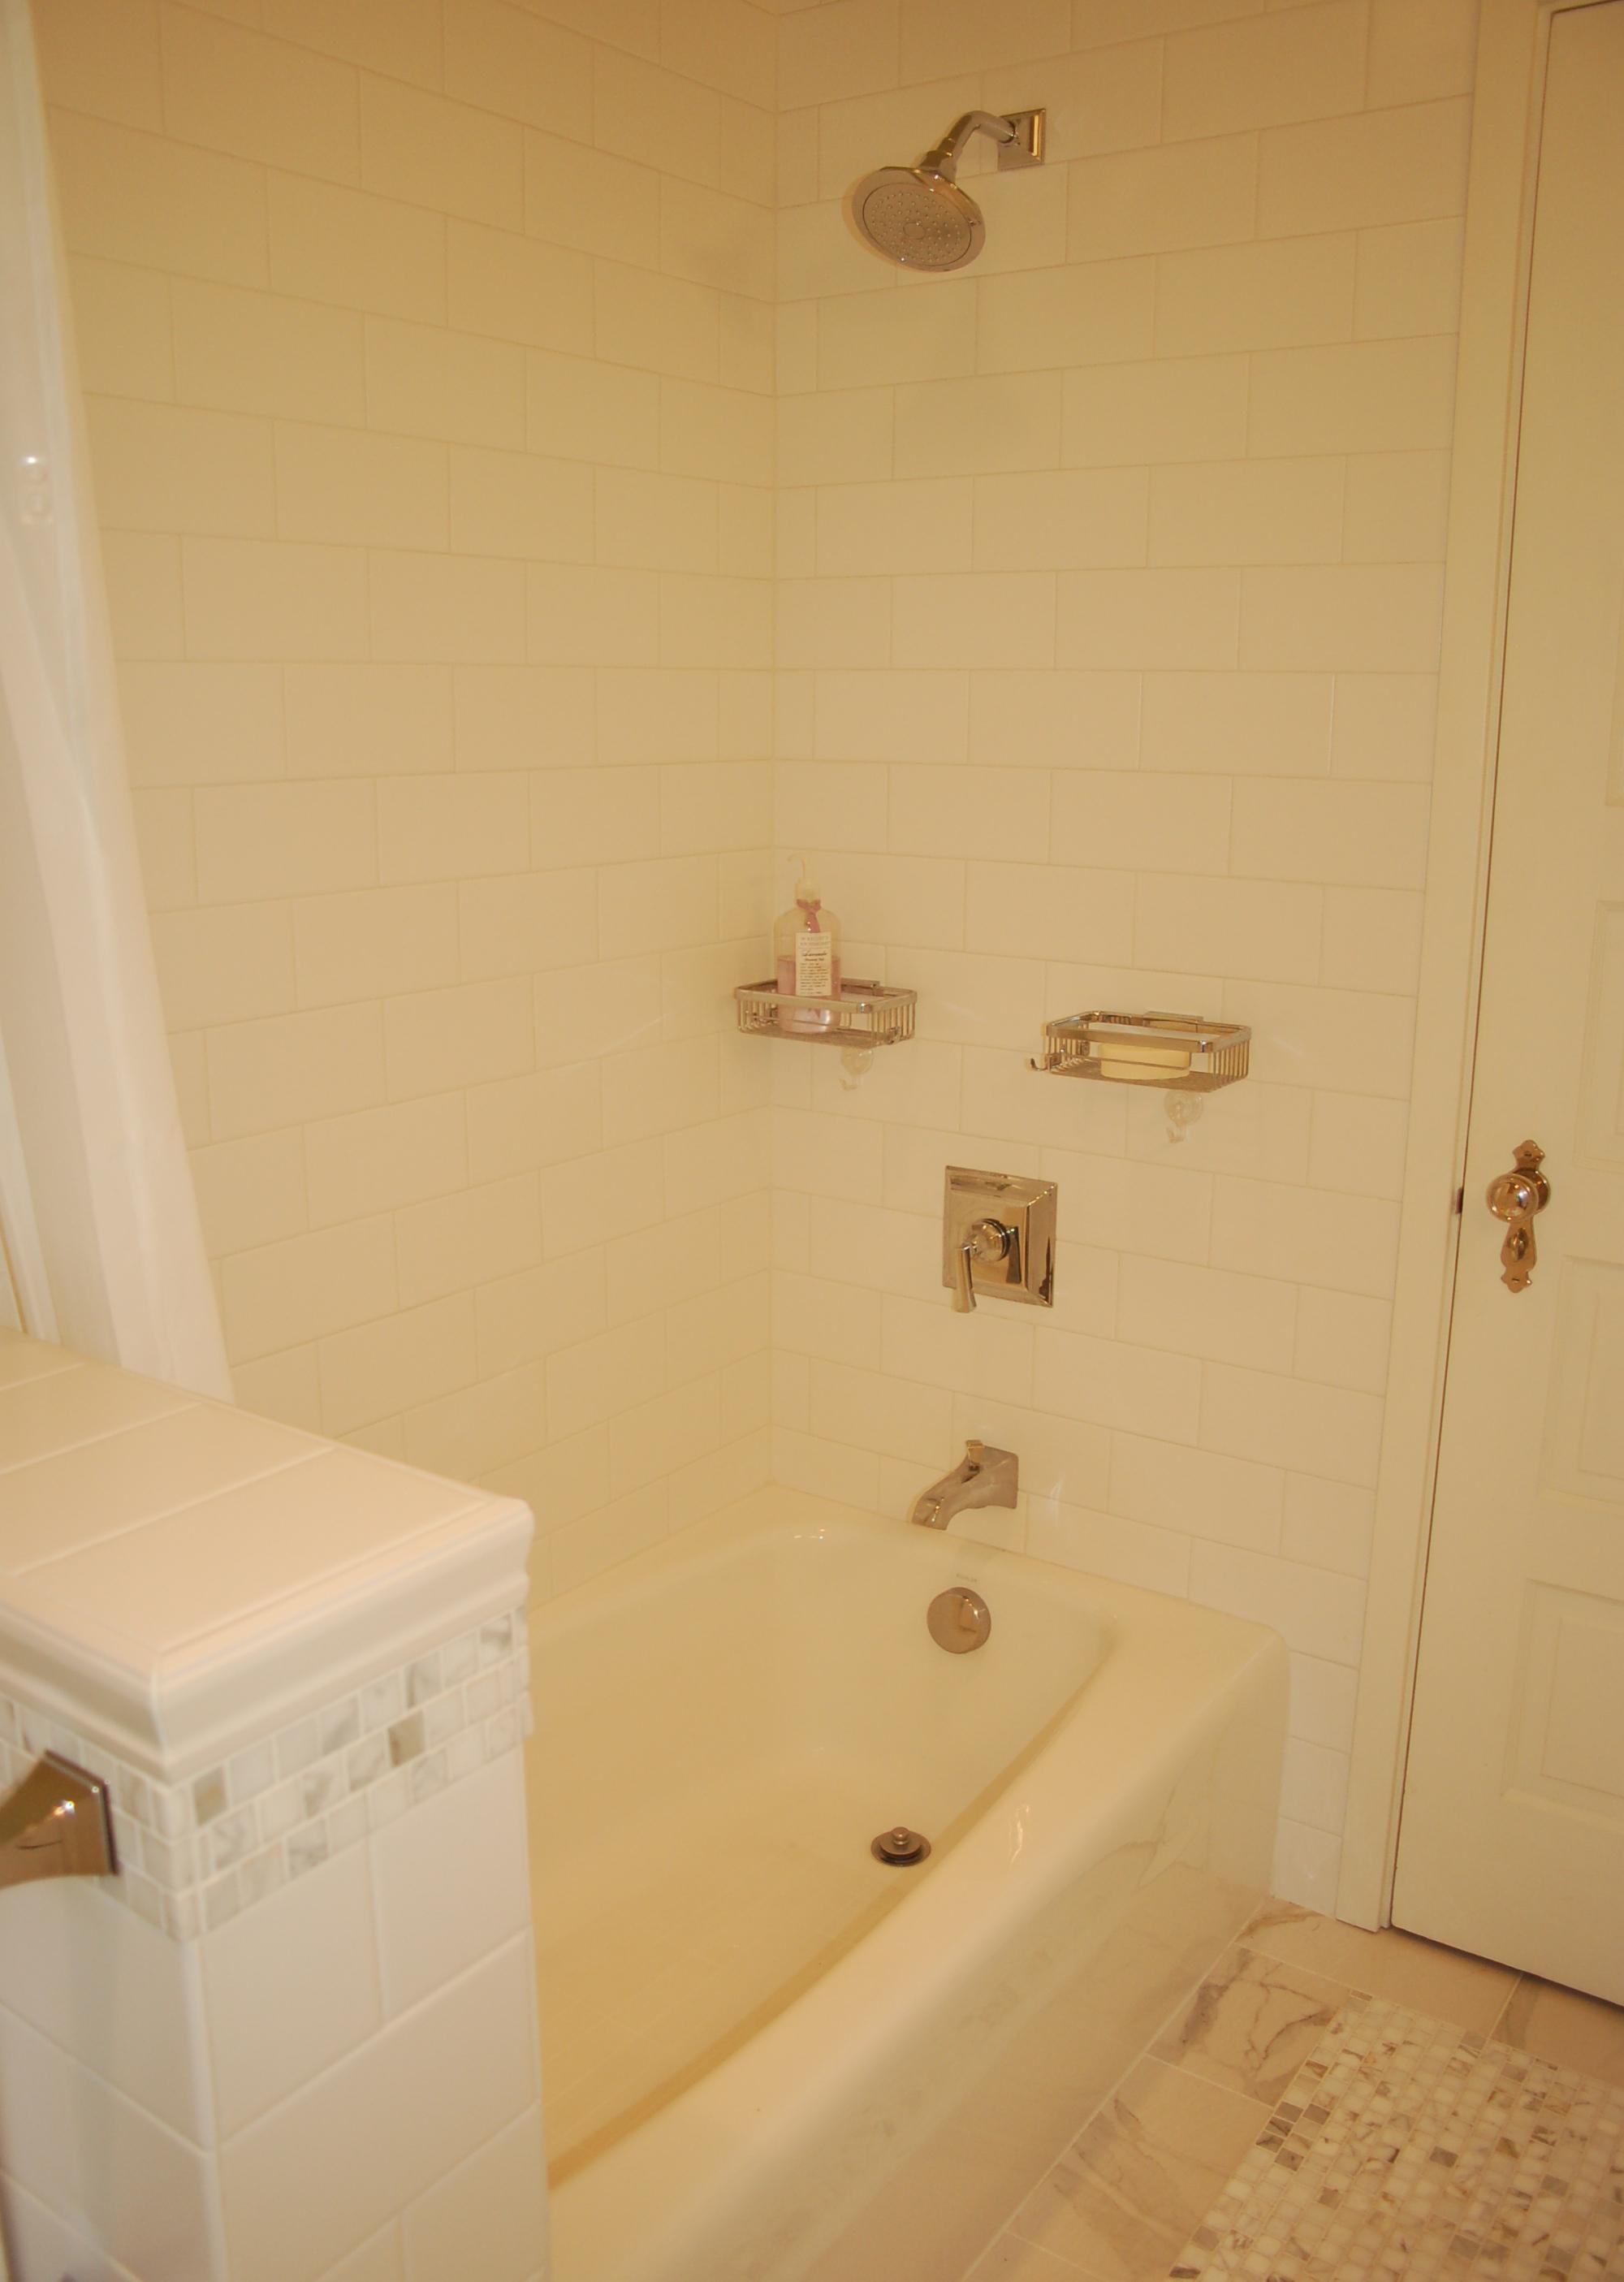 1930 39 s bathroom remodel favinger plumbing bellingham for 1930s bathroom renovation